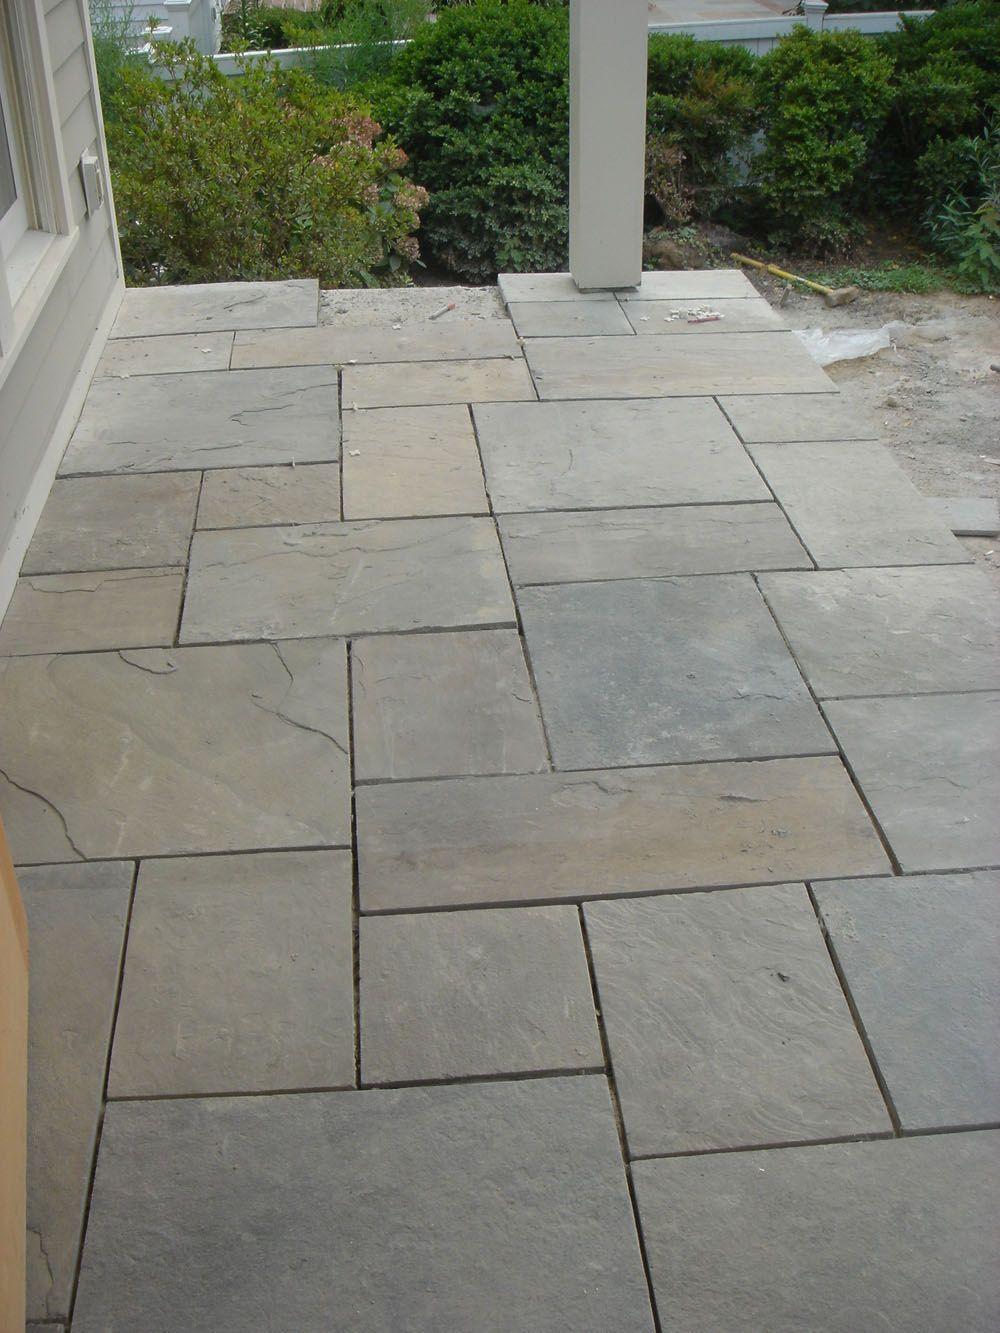 Outdoor Patio Carpet Squares: Vinyl Flooring For Outdoor Patio